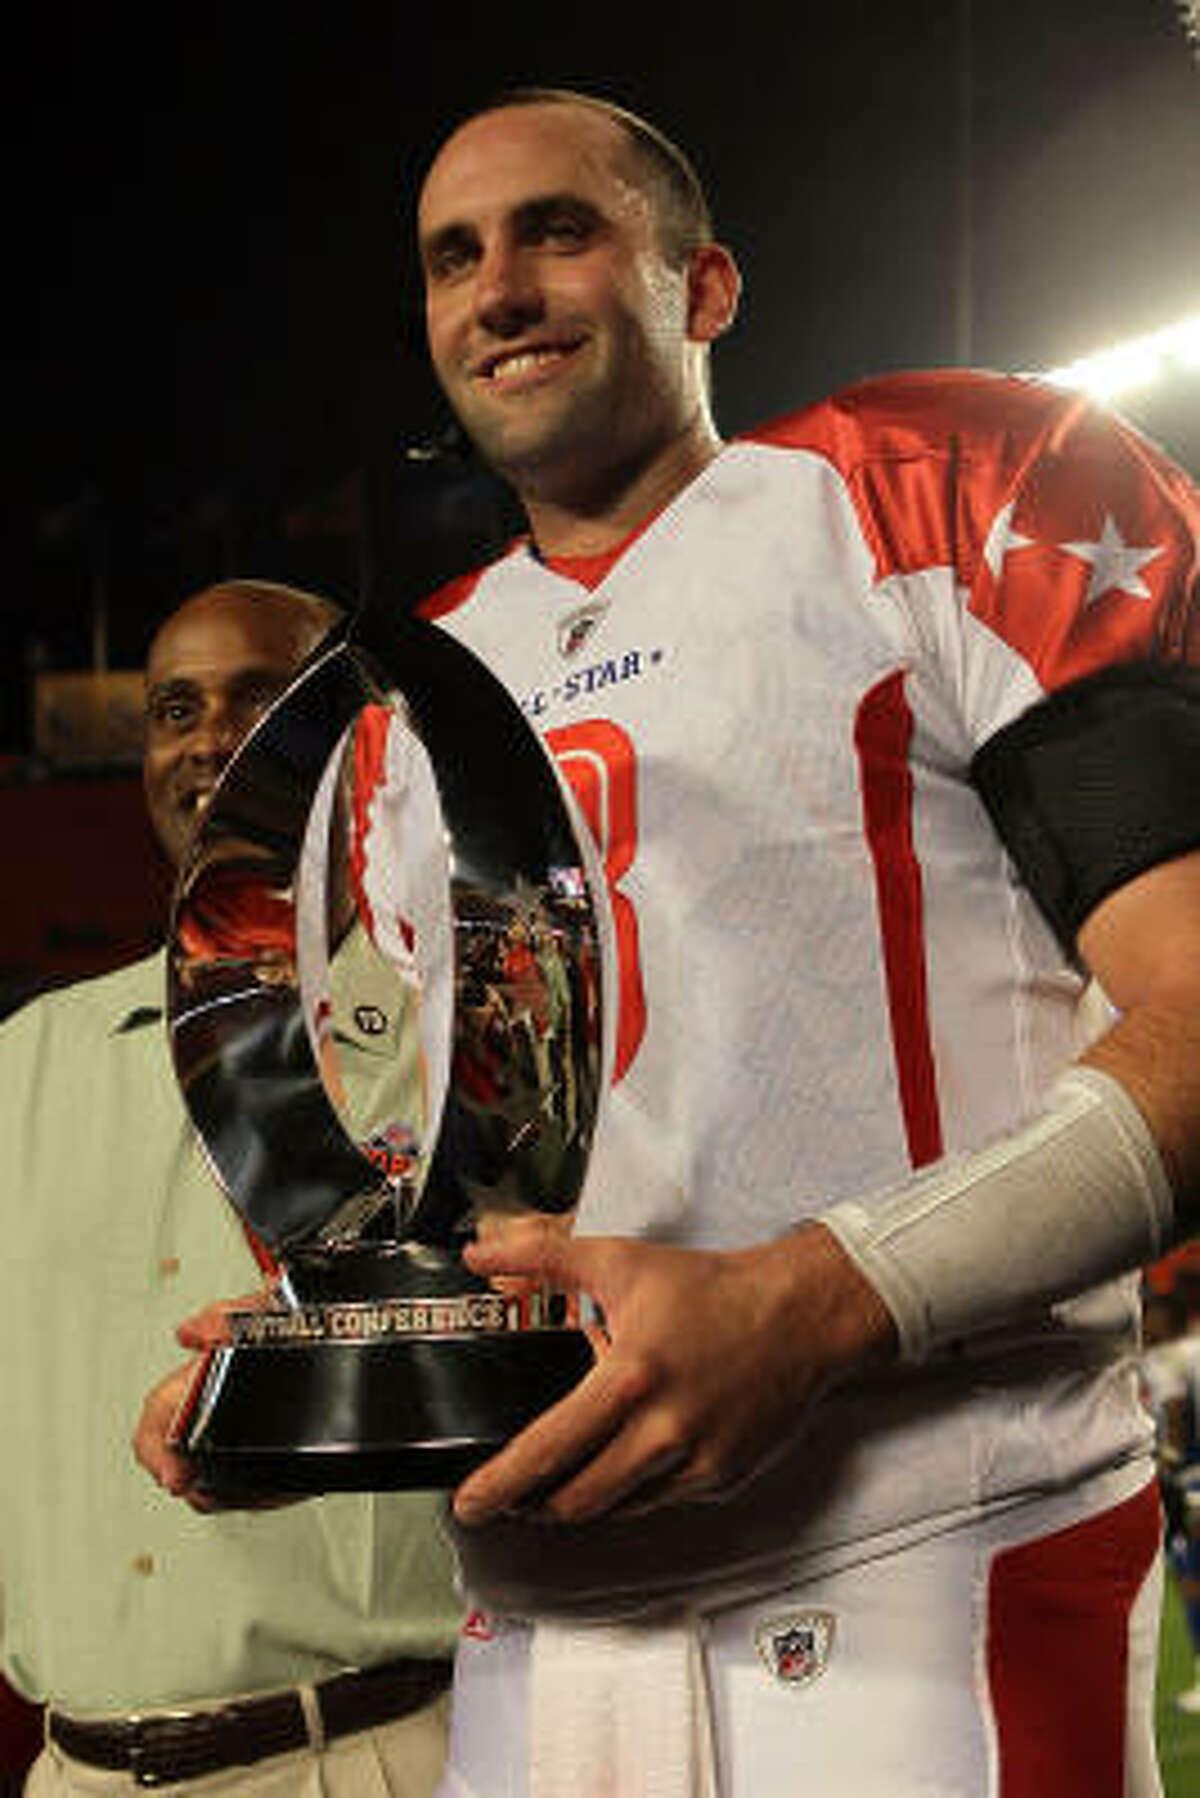 Texans quarterback Matt Schaub receives the MVP trophy after the 2010 Pro Bowl.